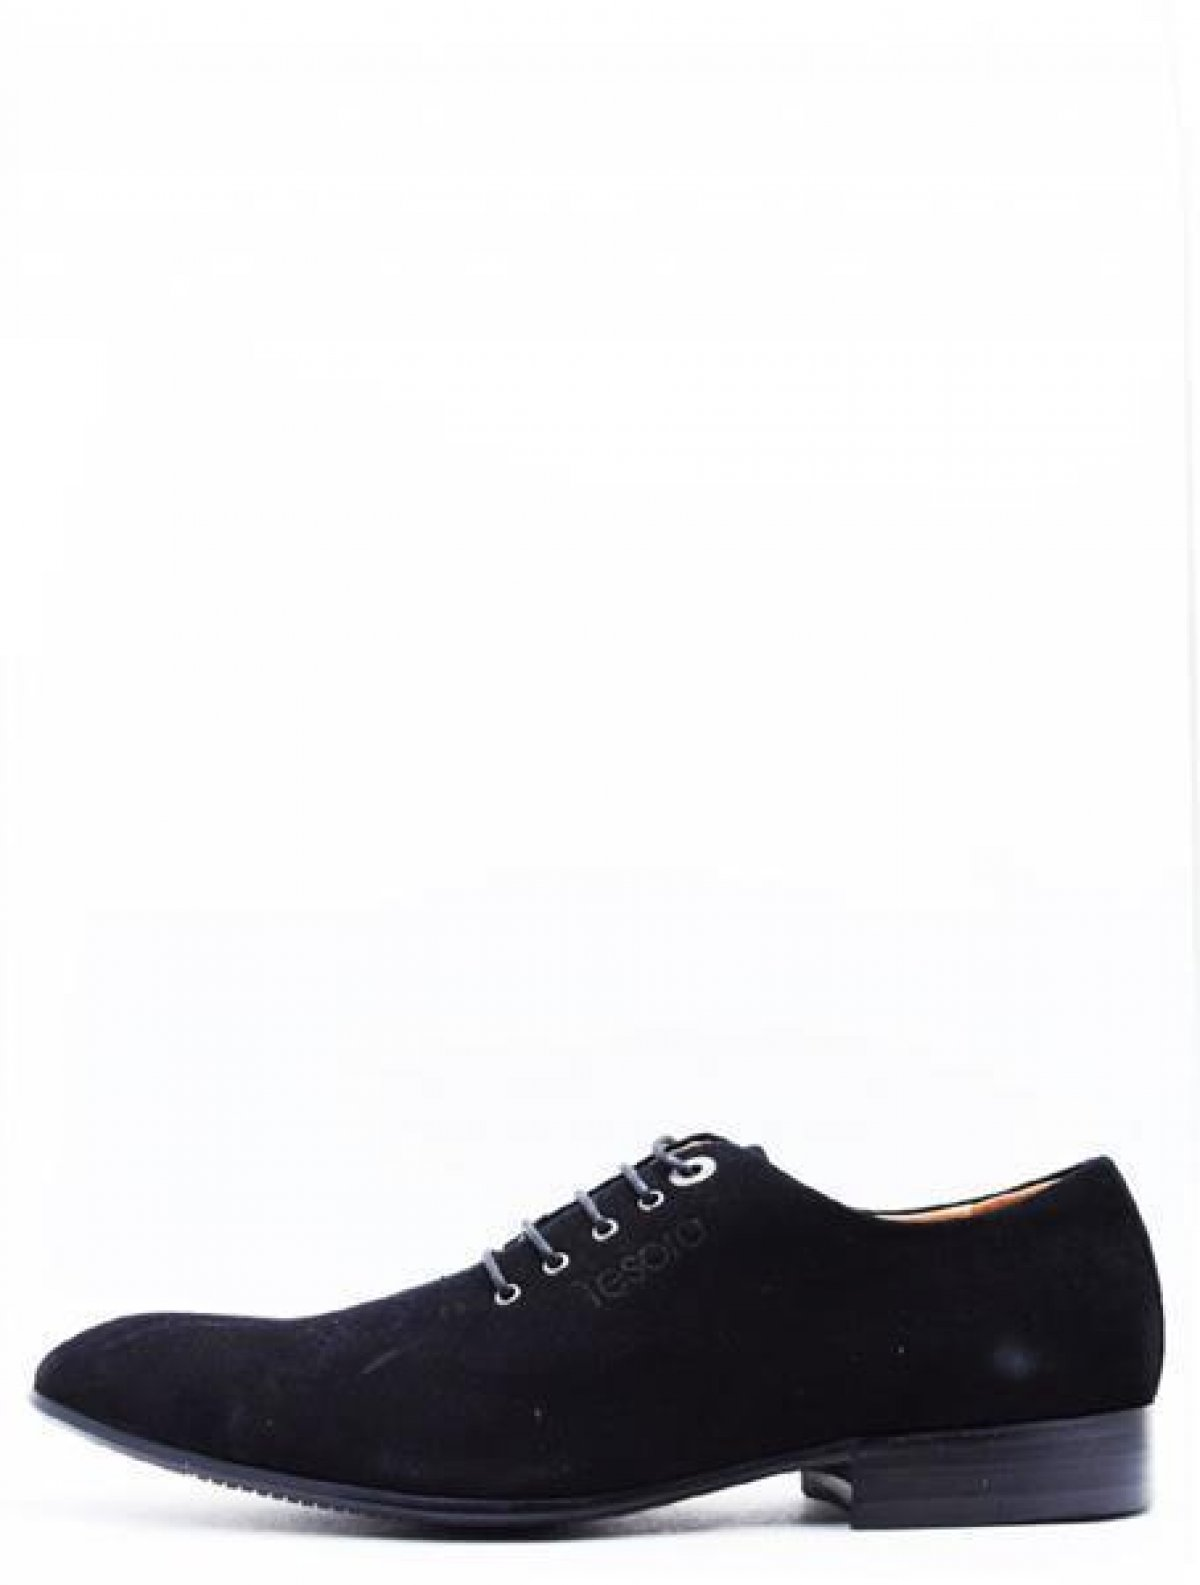 648203/03-4T мужские туфли